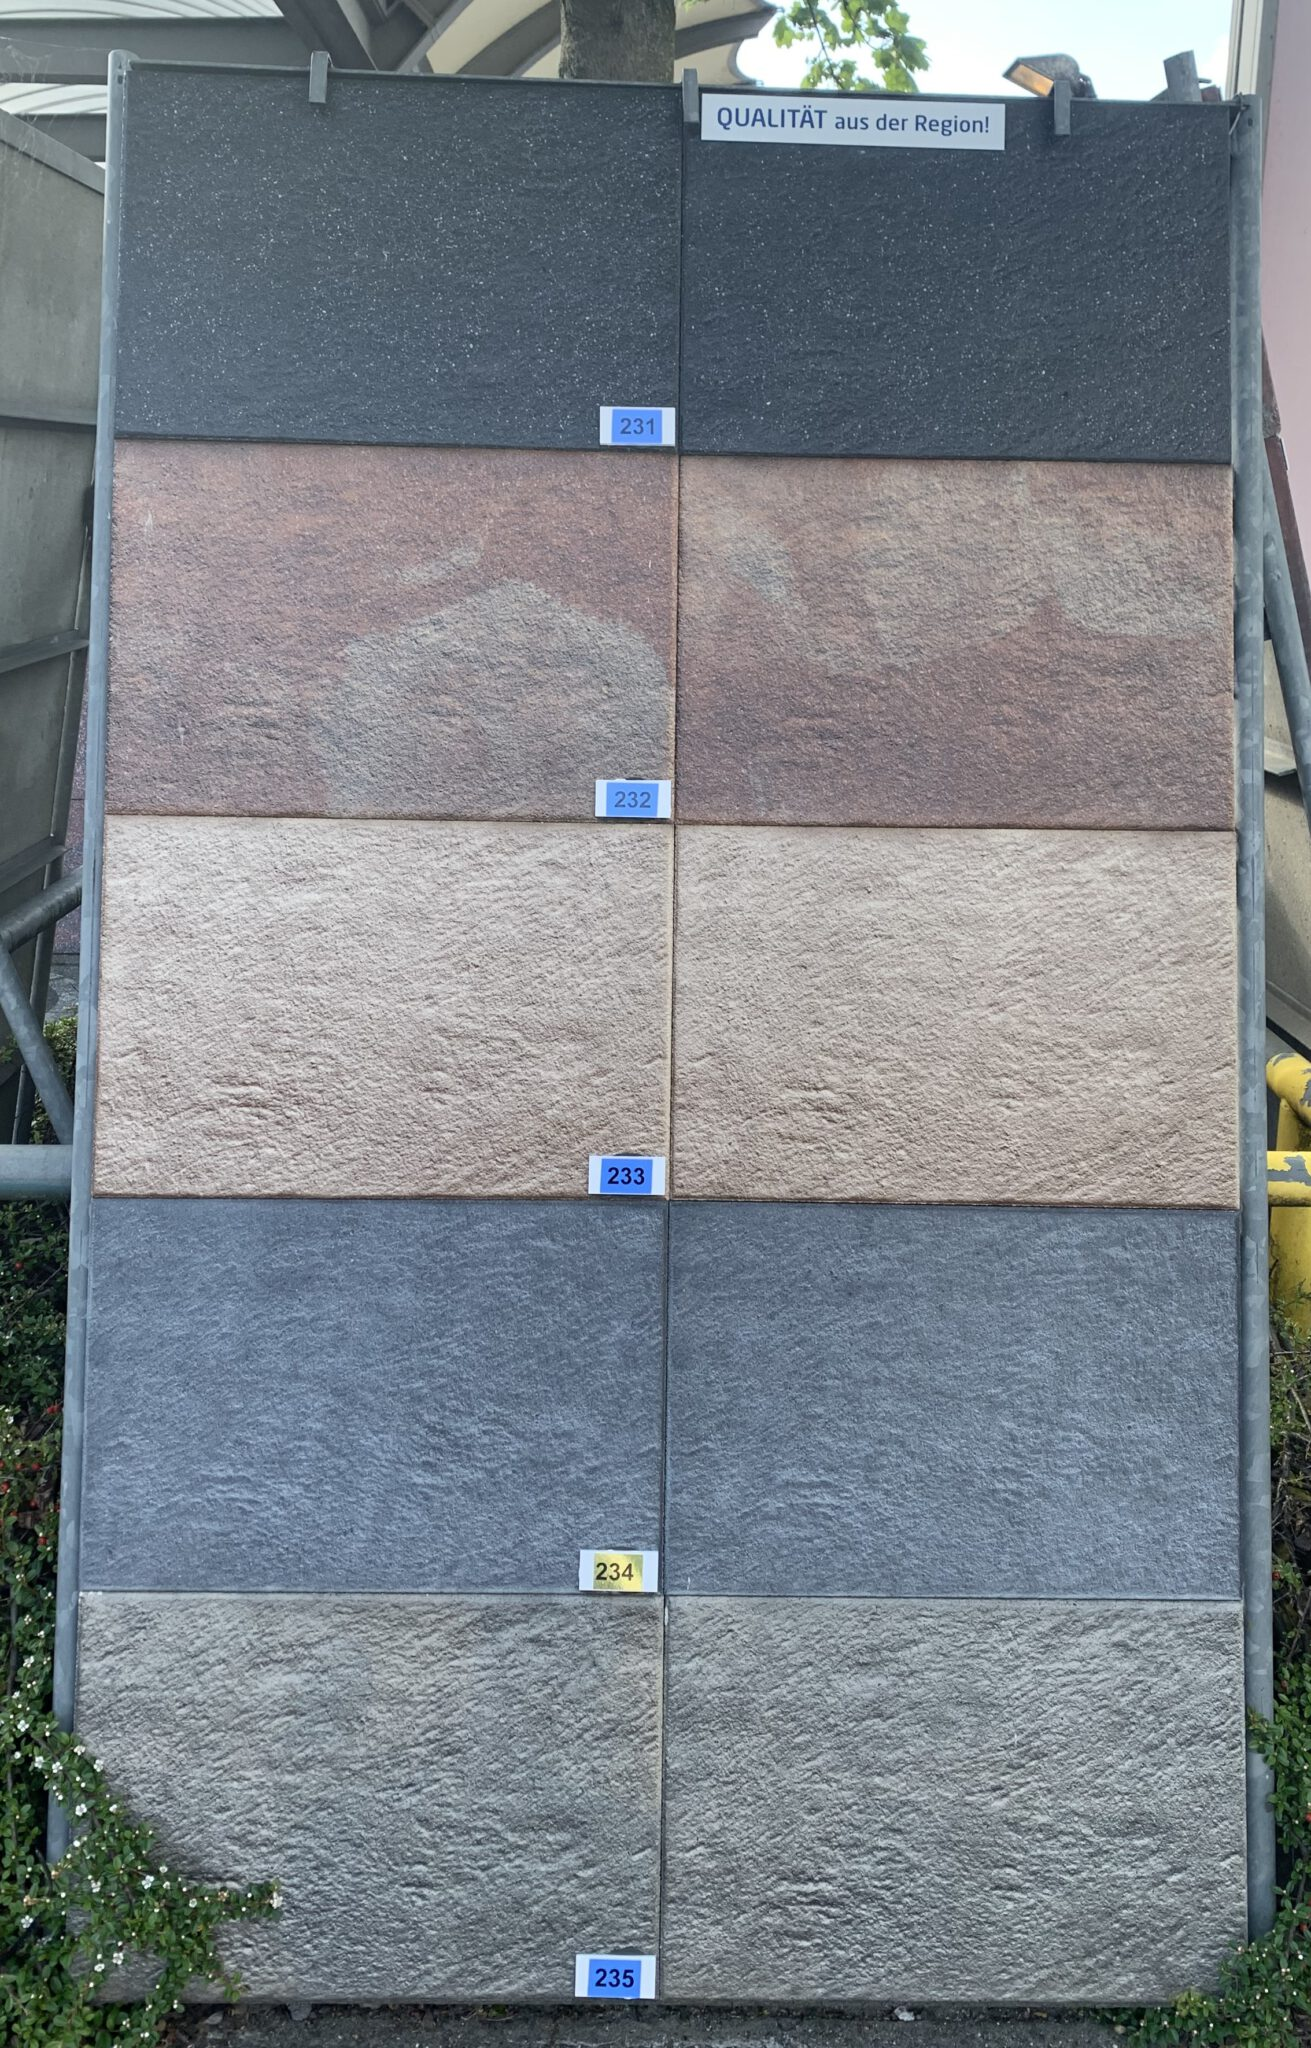 Terrassenplatte Novaclean efecto beige bei Stolzenbach Baustoffe in Bremen kaufen